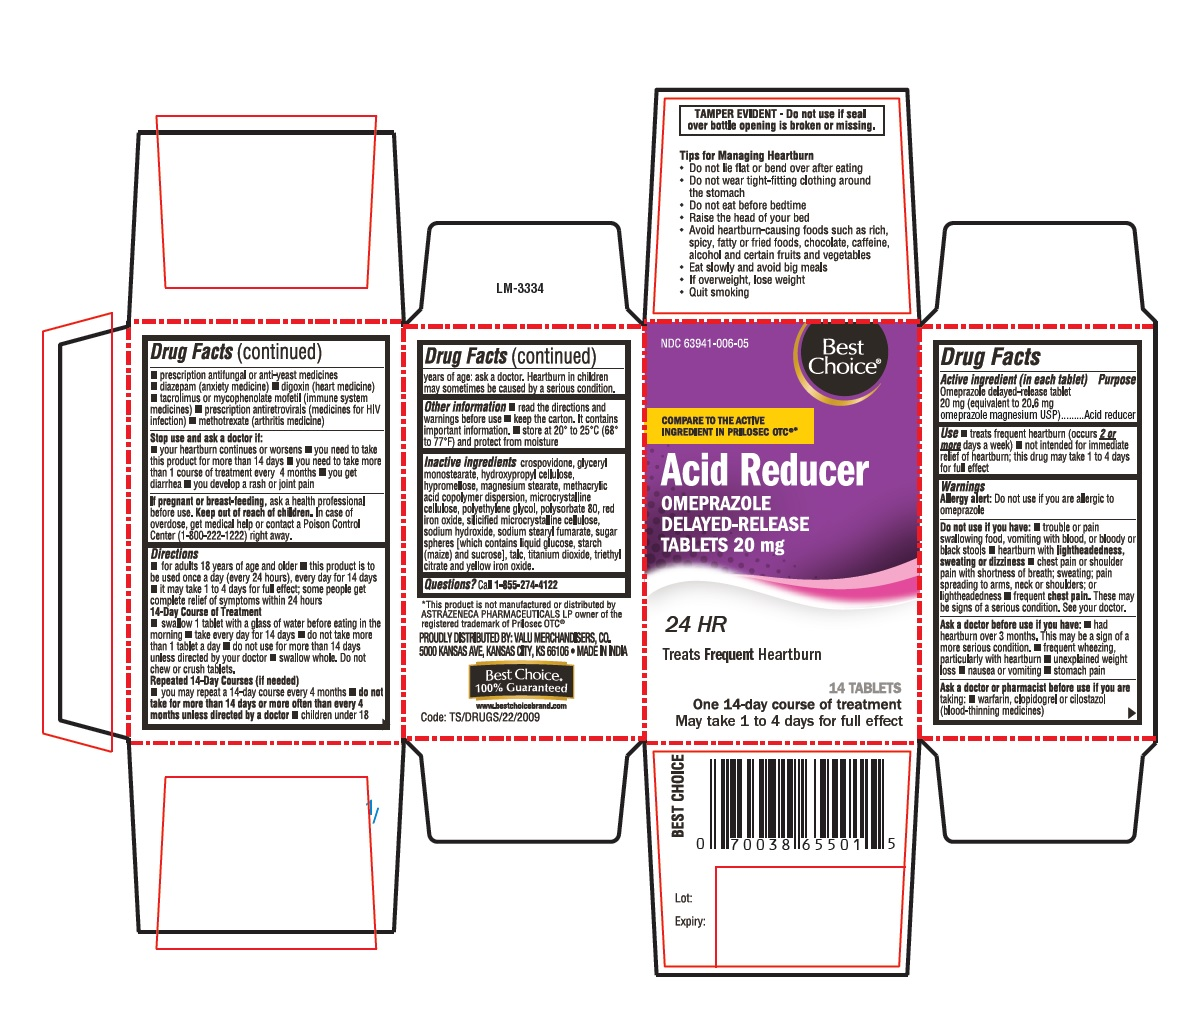 PACKAGE LABEL-PRINCIPAL DISPLAY PANEL - 20 mg Blister Carton Label